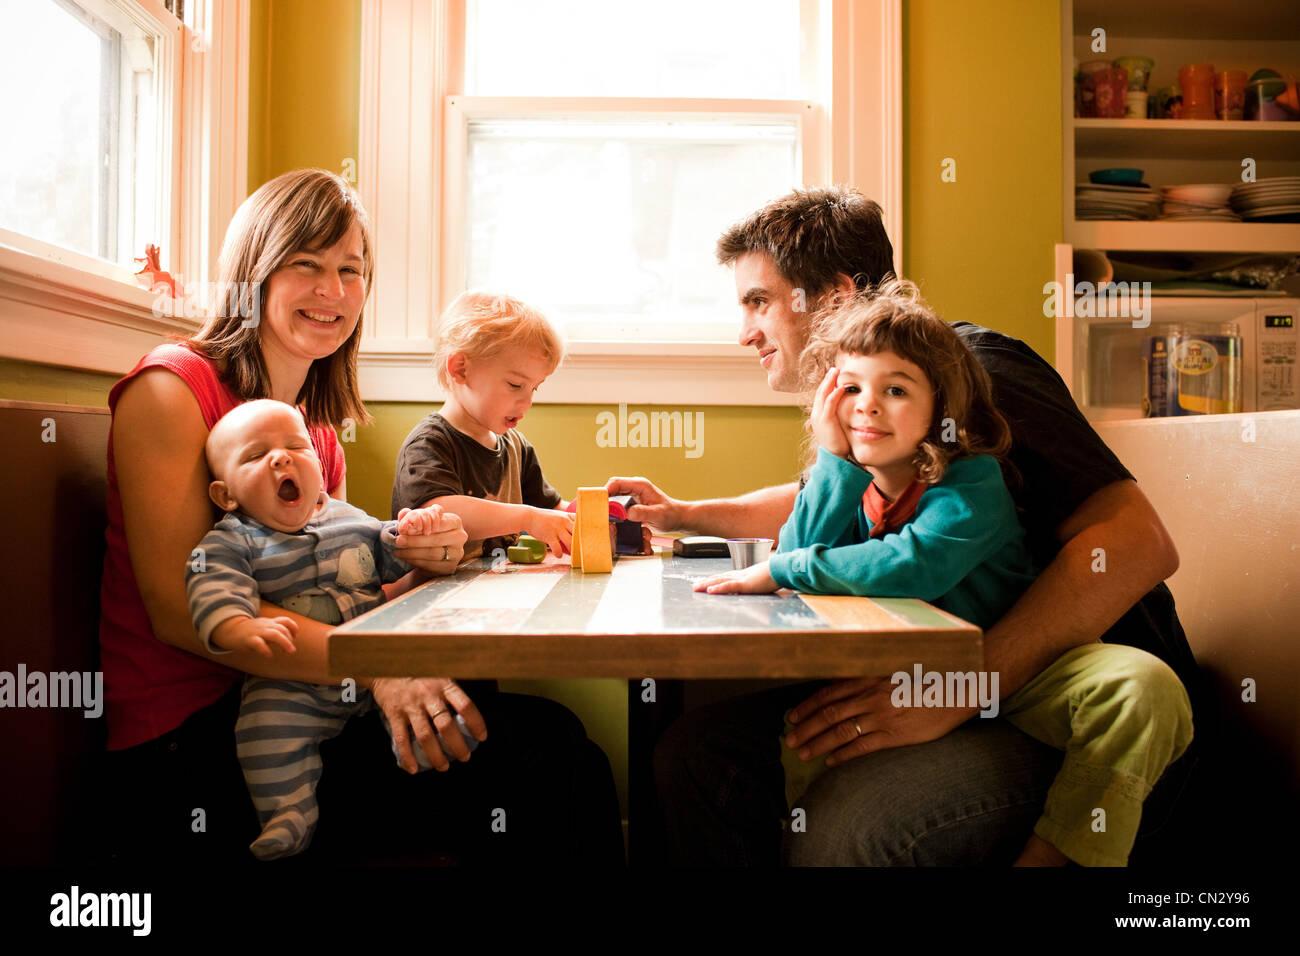 Familia sentada a la mesa de la cocina Imagen De Stock